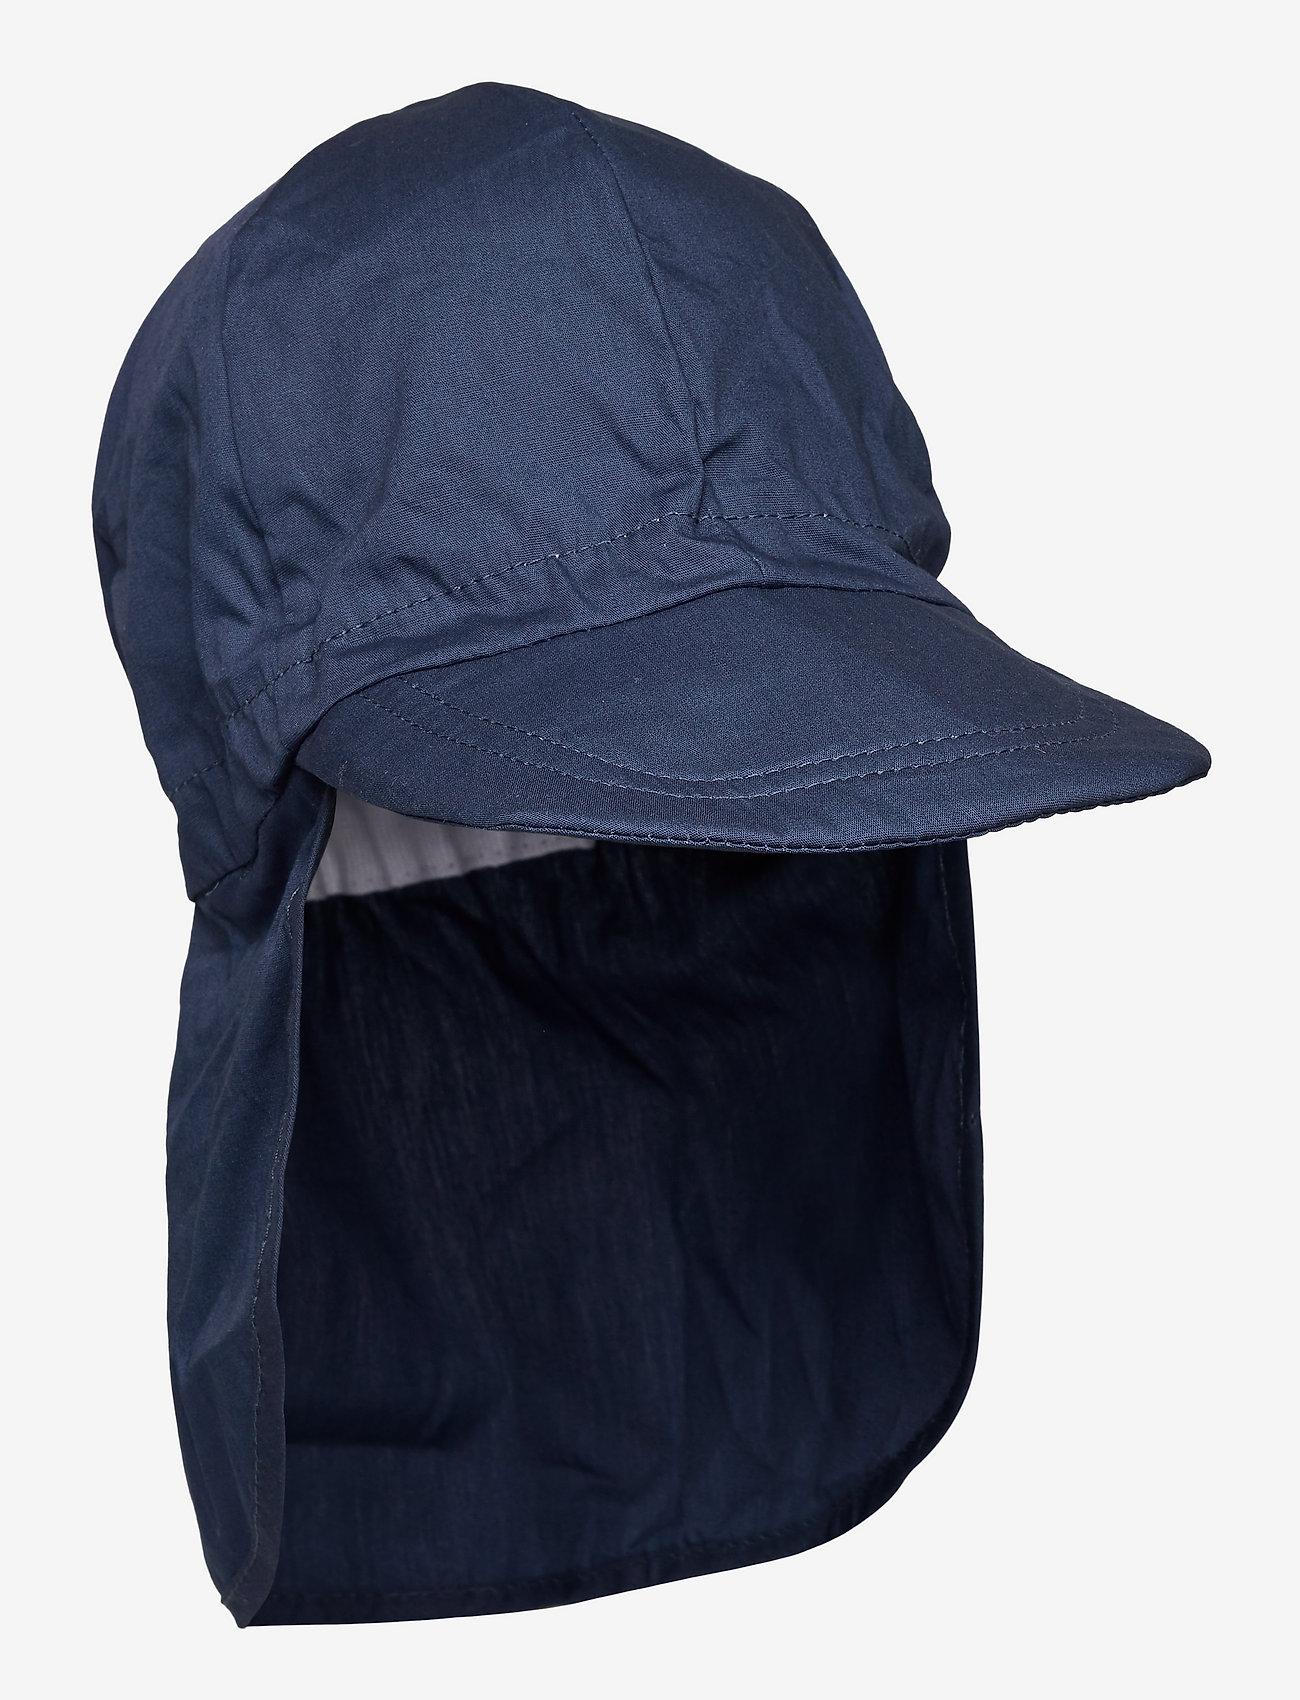 Melton - Cap w/neck - Solid colour - czapki i kapelusze - 285/marine - 0